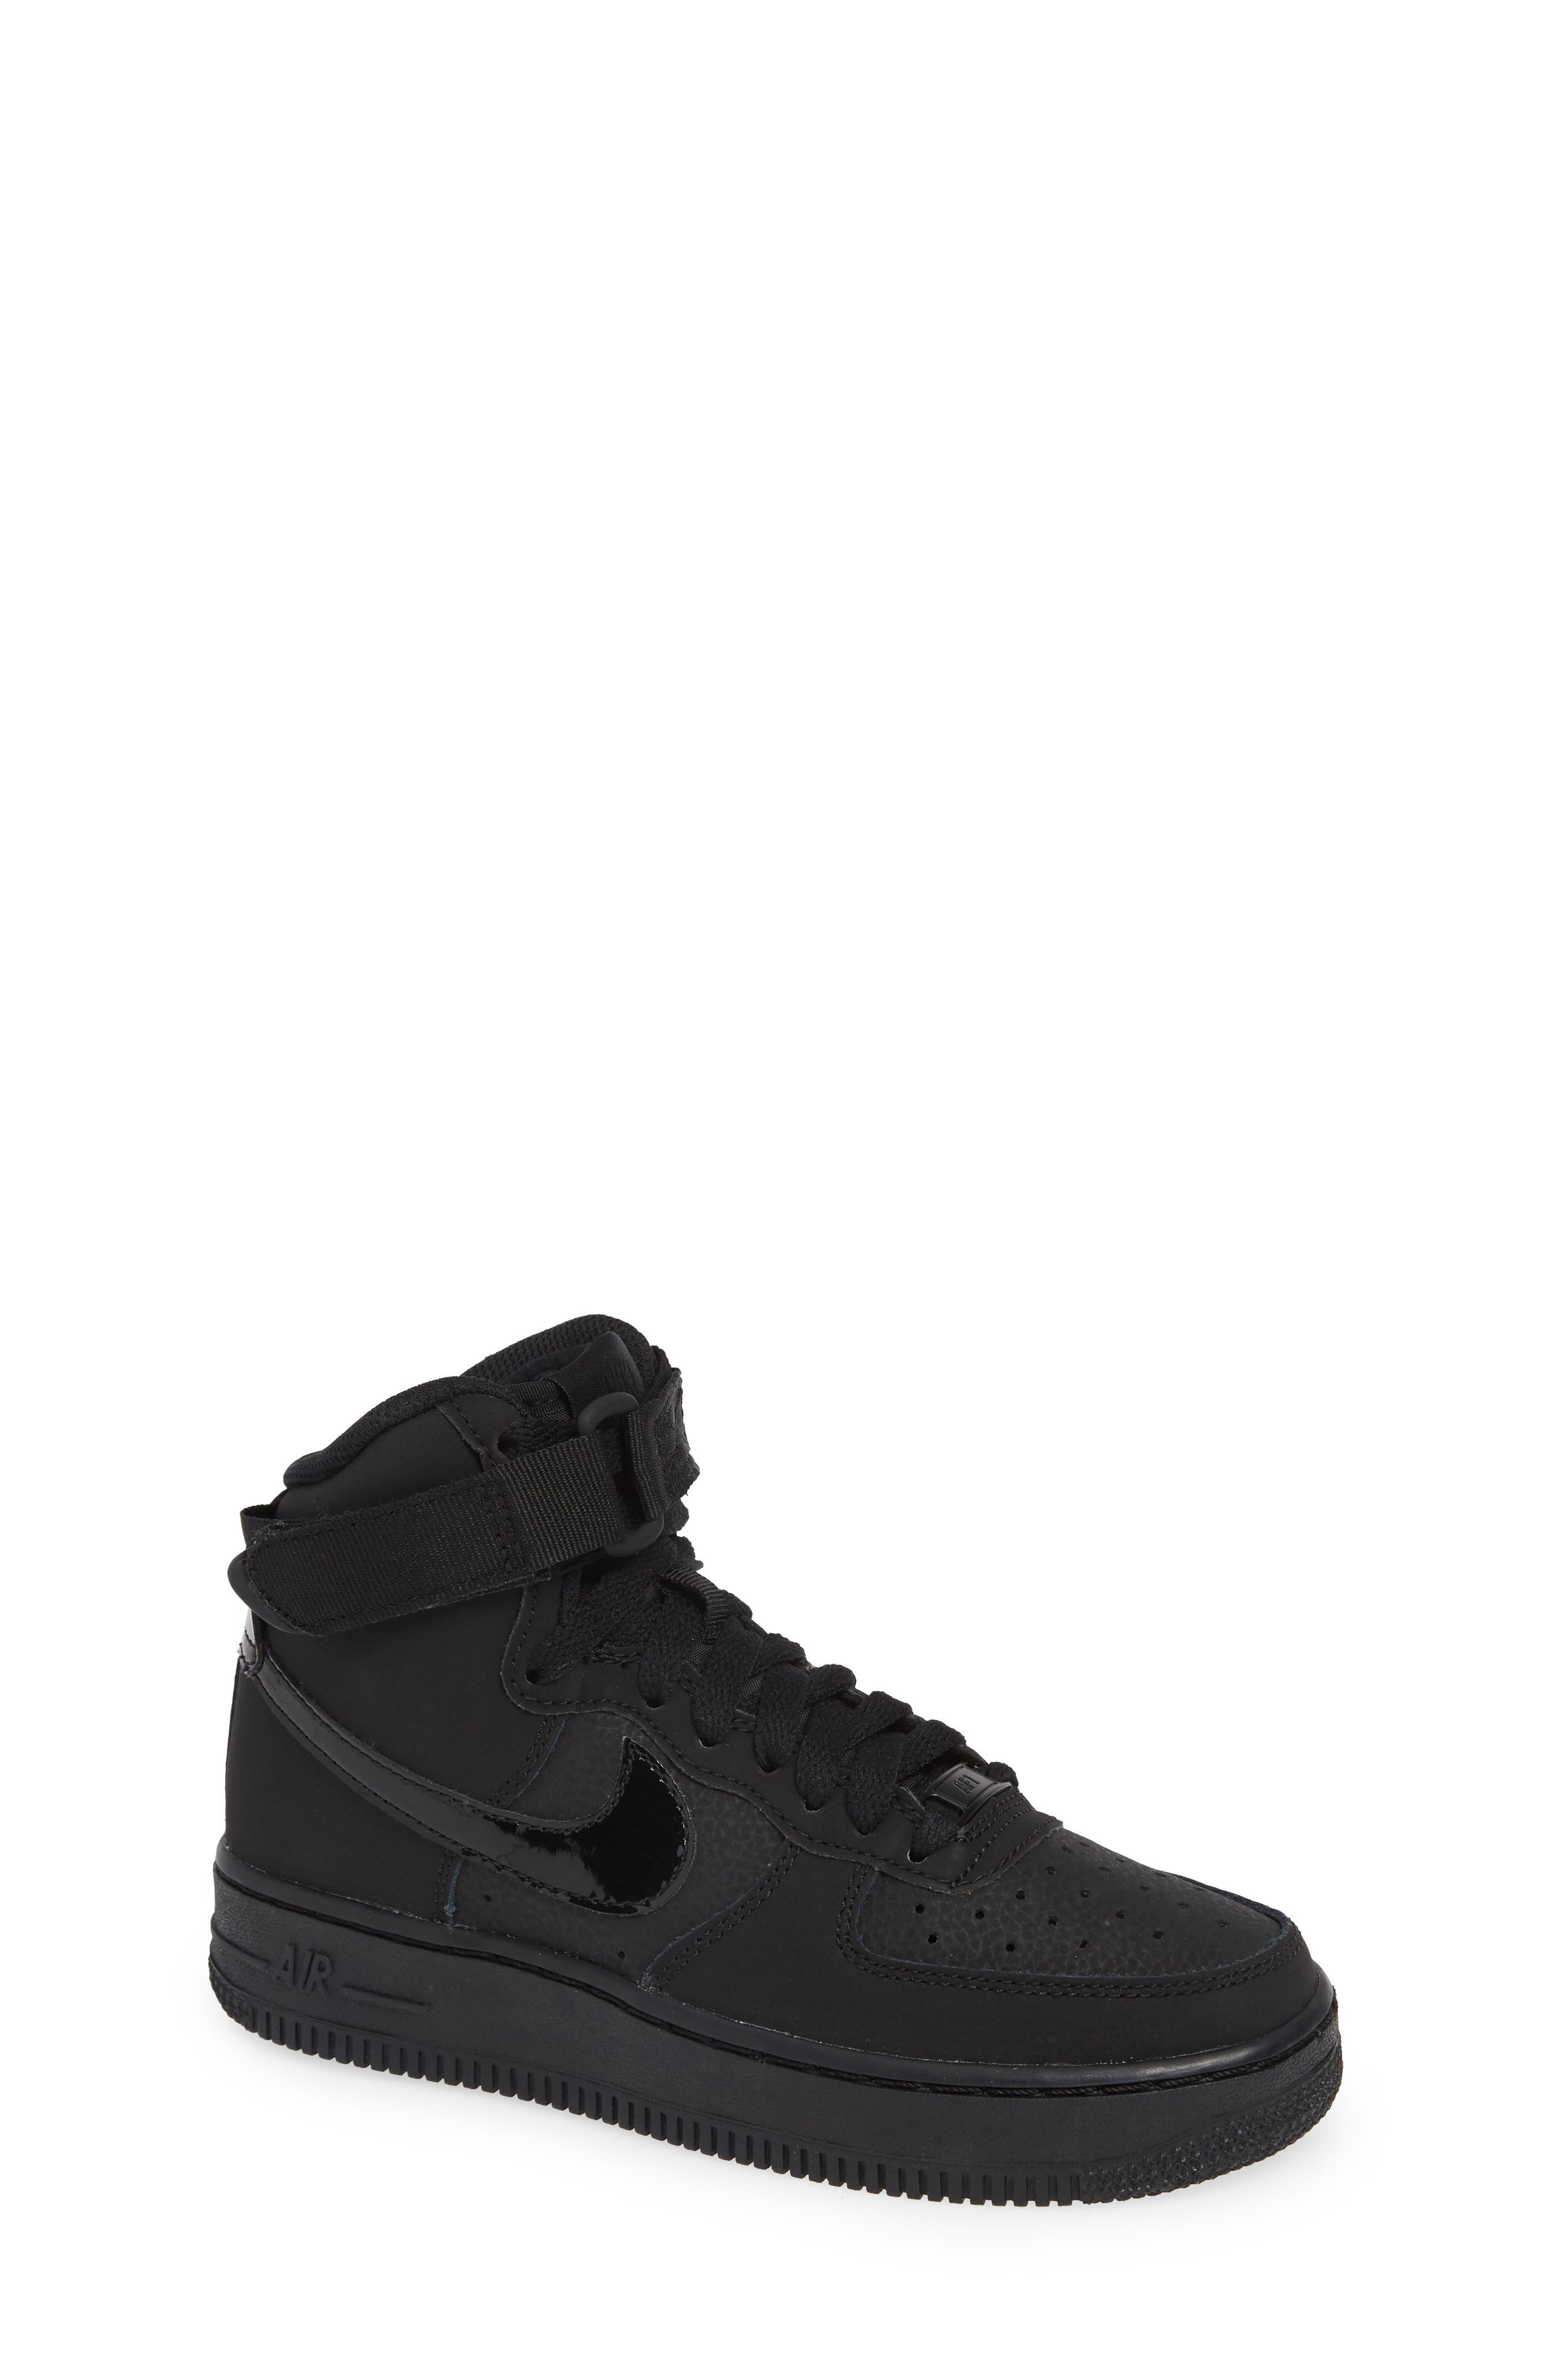 NIKE, Air Force 1 High Top Sneaker, Main thumbnail 1, color, 001